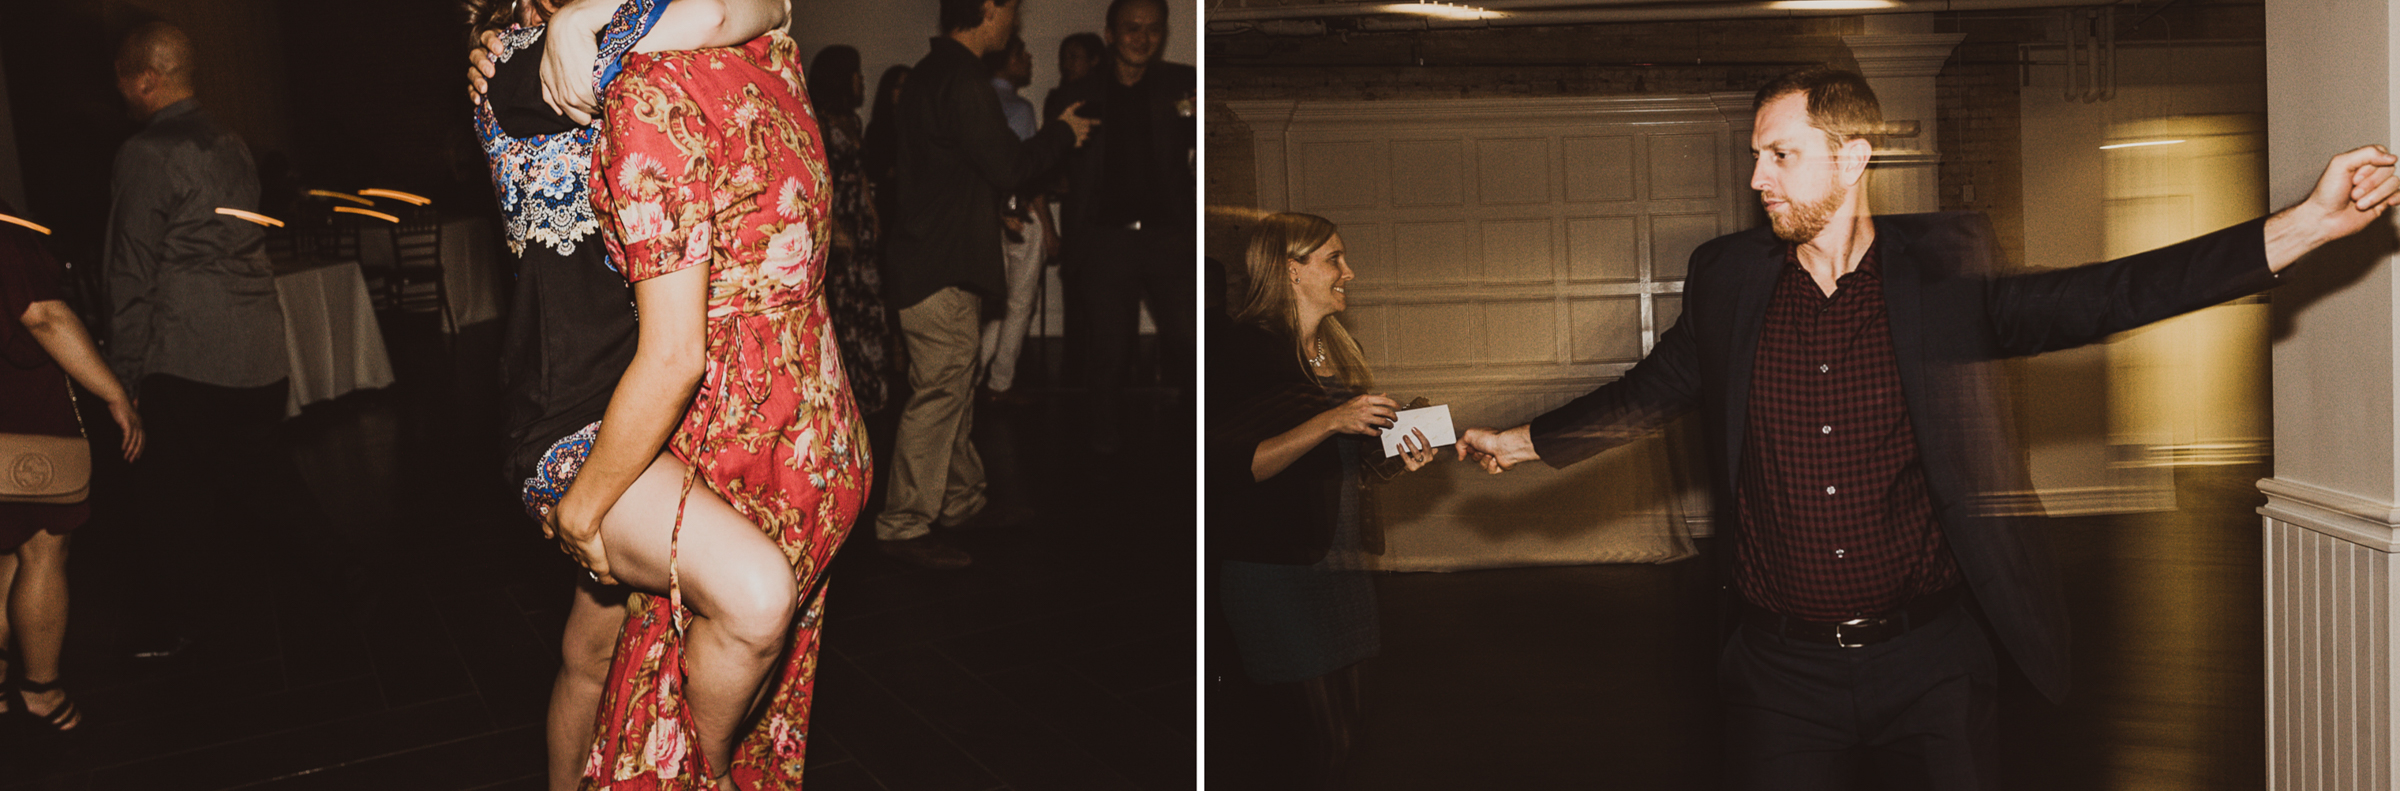 ©Isaiah + Taylor Photography - The Estate On Second Wedding, Santa Ana - Orange County Wedding Photographer-173.jpg